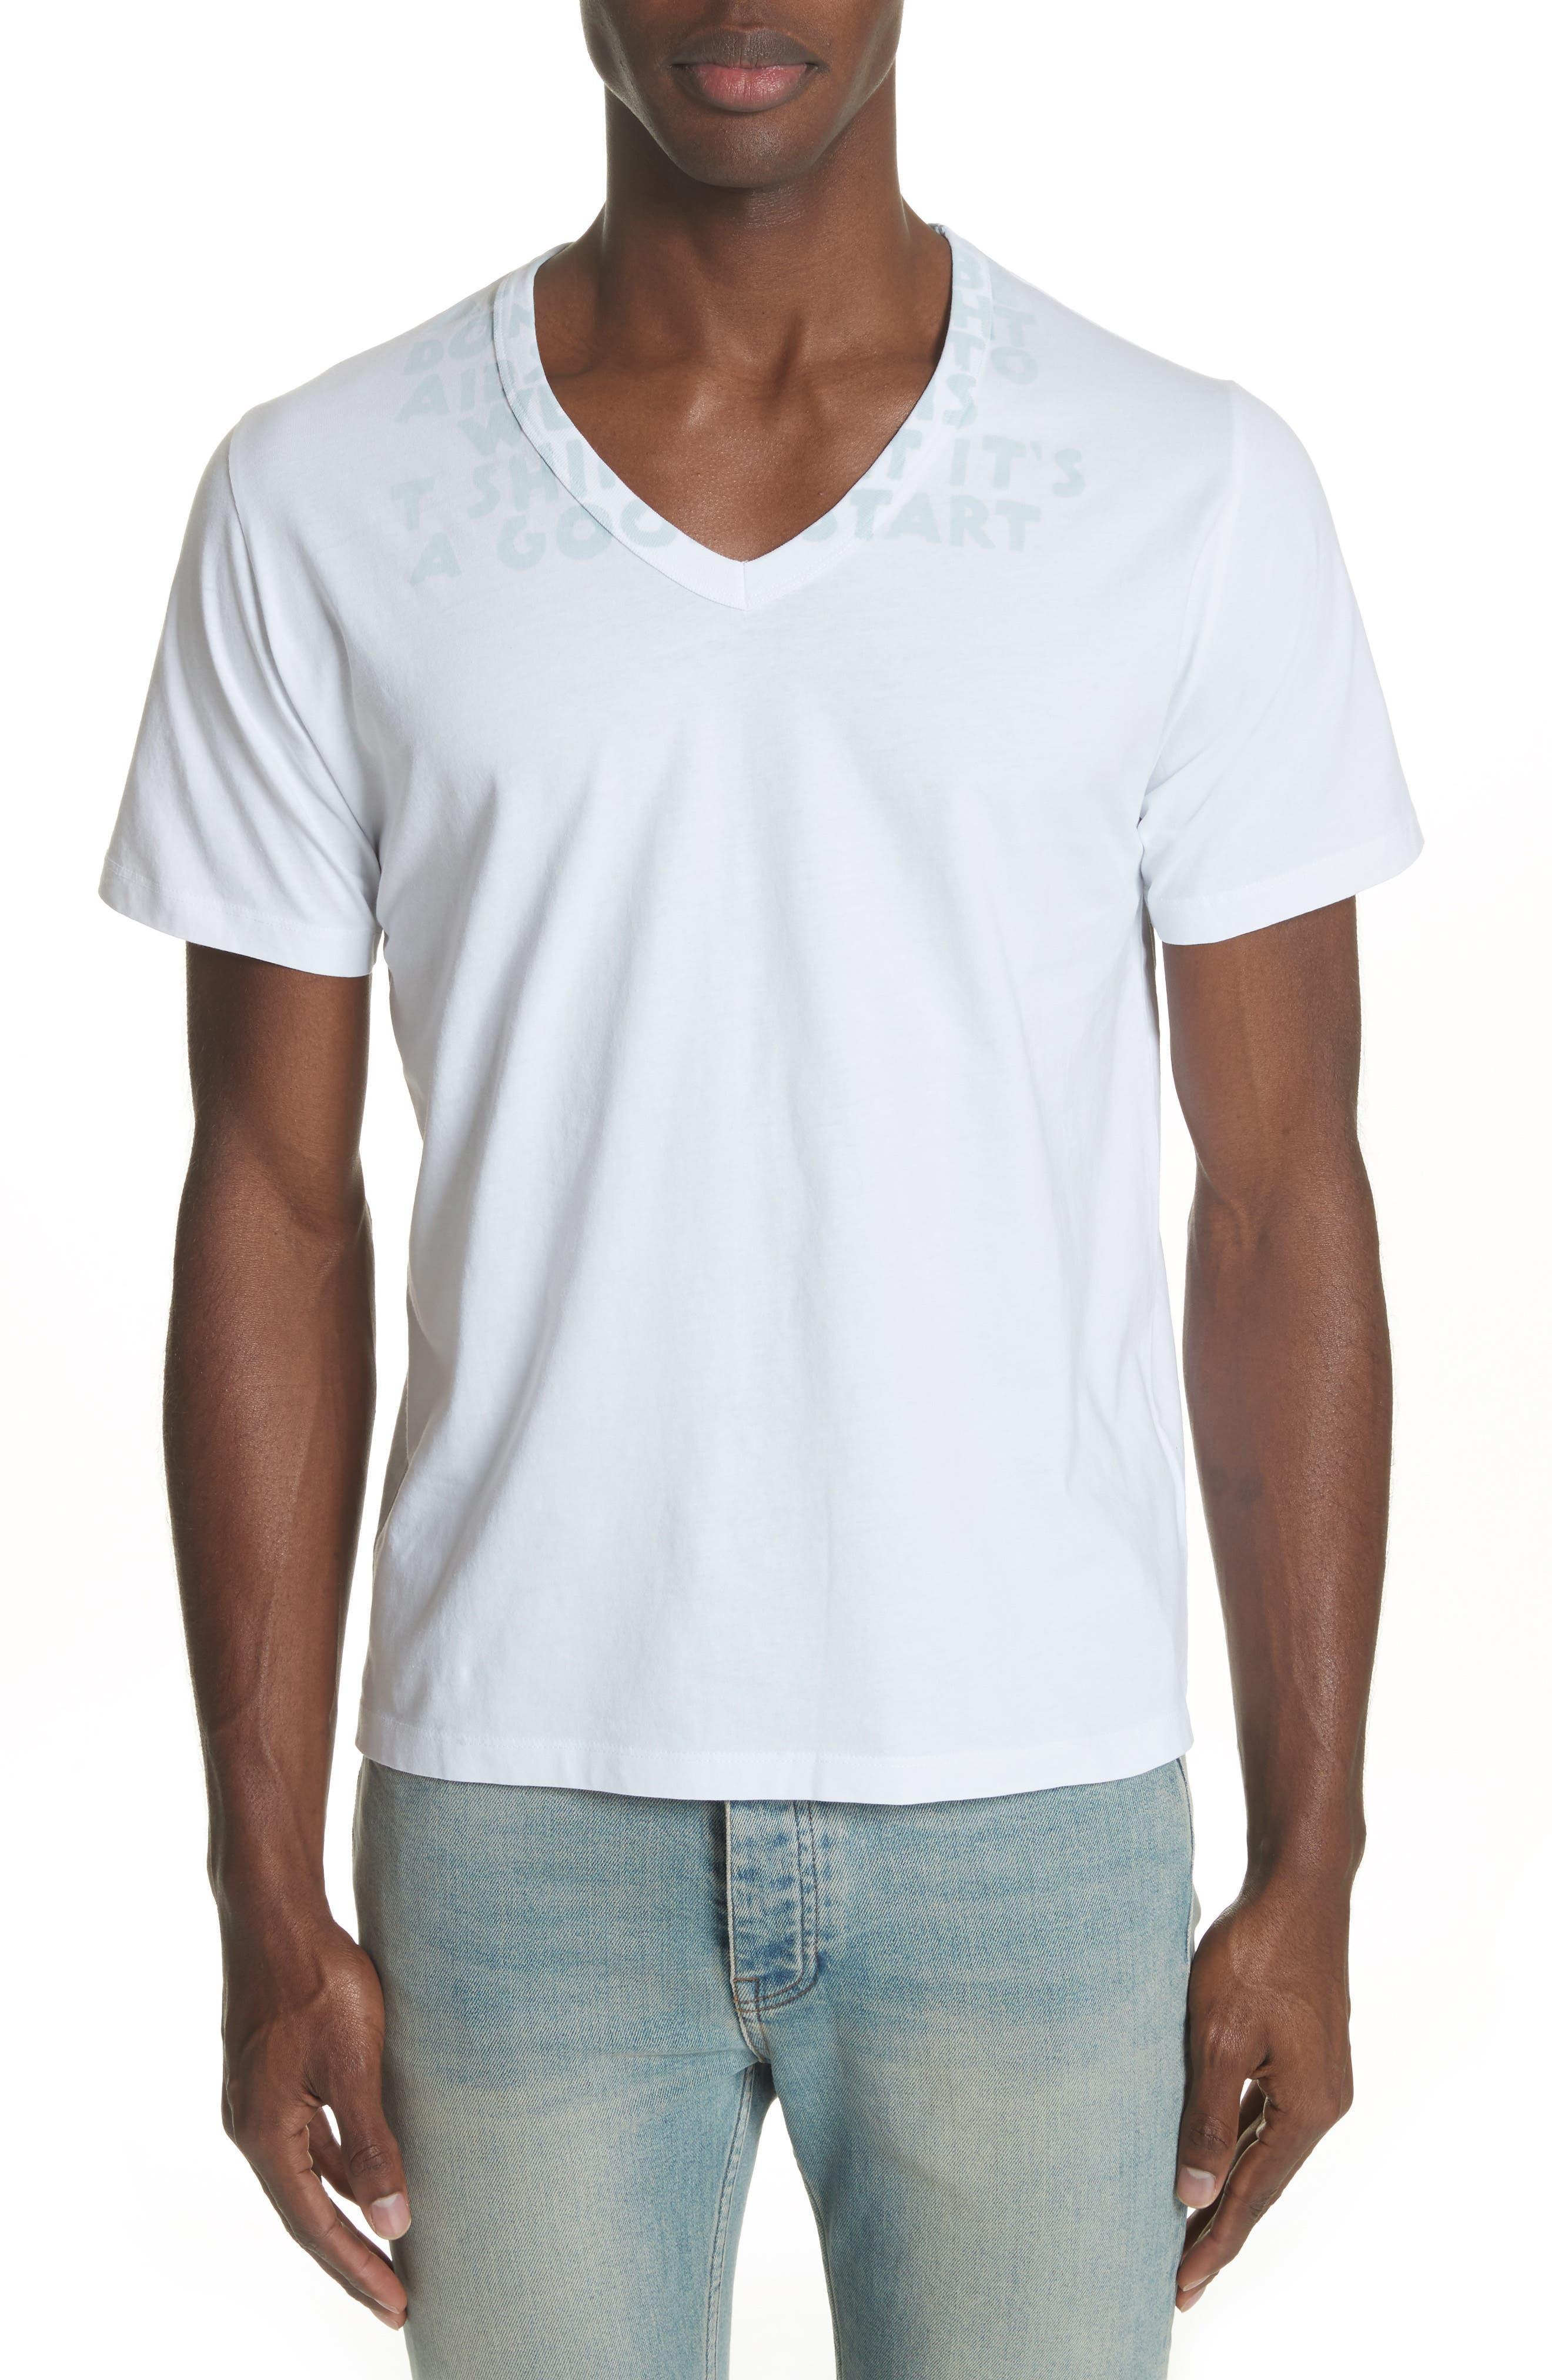 Alternate Image 1 Selected - Maison Margiela V-Neck T-Shirt